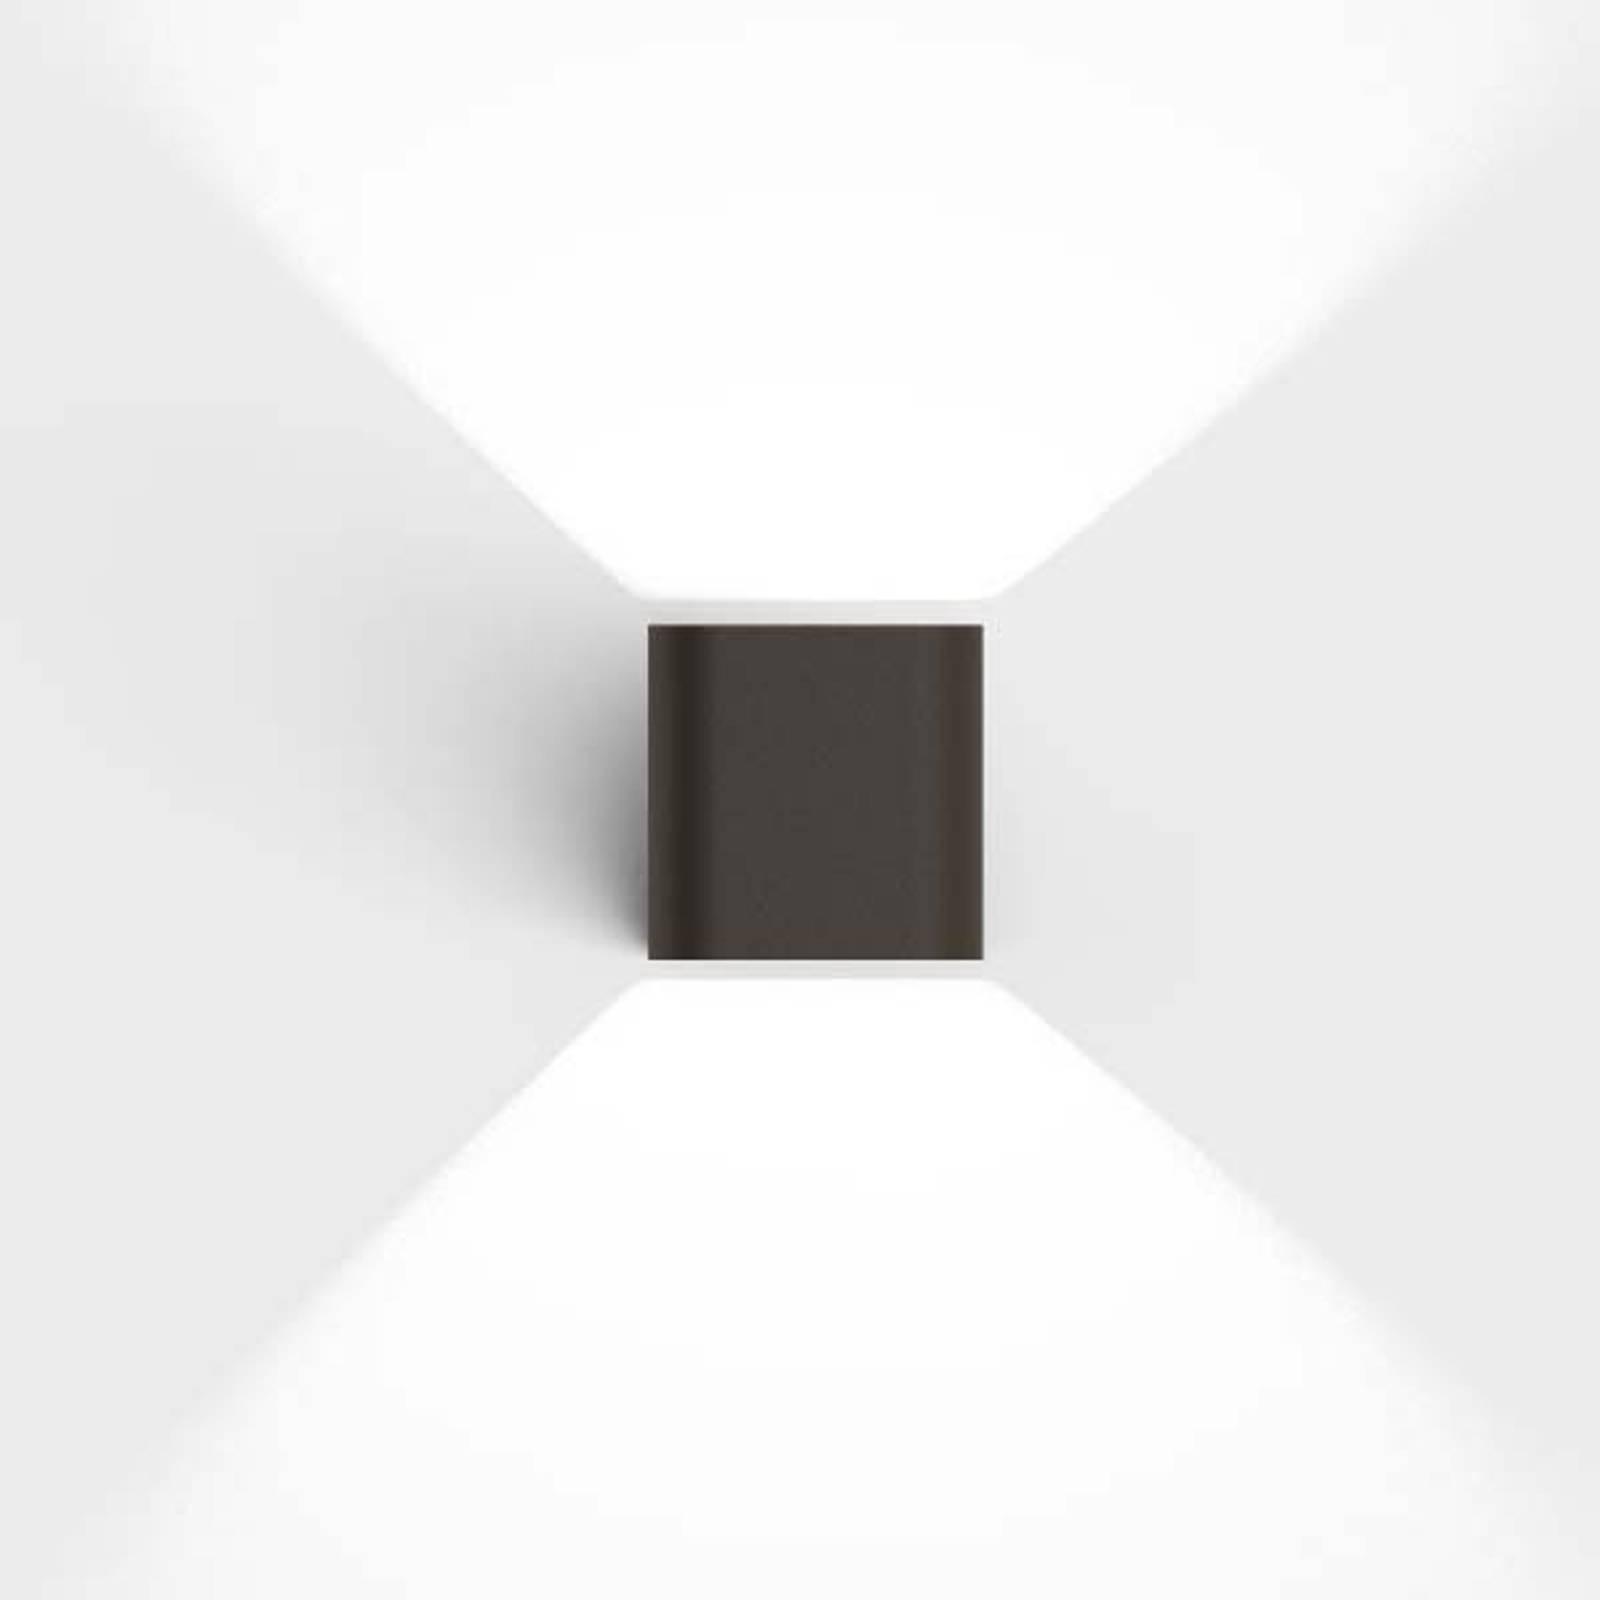 IP44.de Intro 2.0 LED-Außenwandleuchte, cool brown